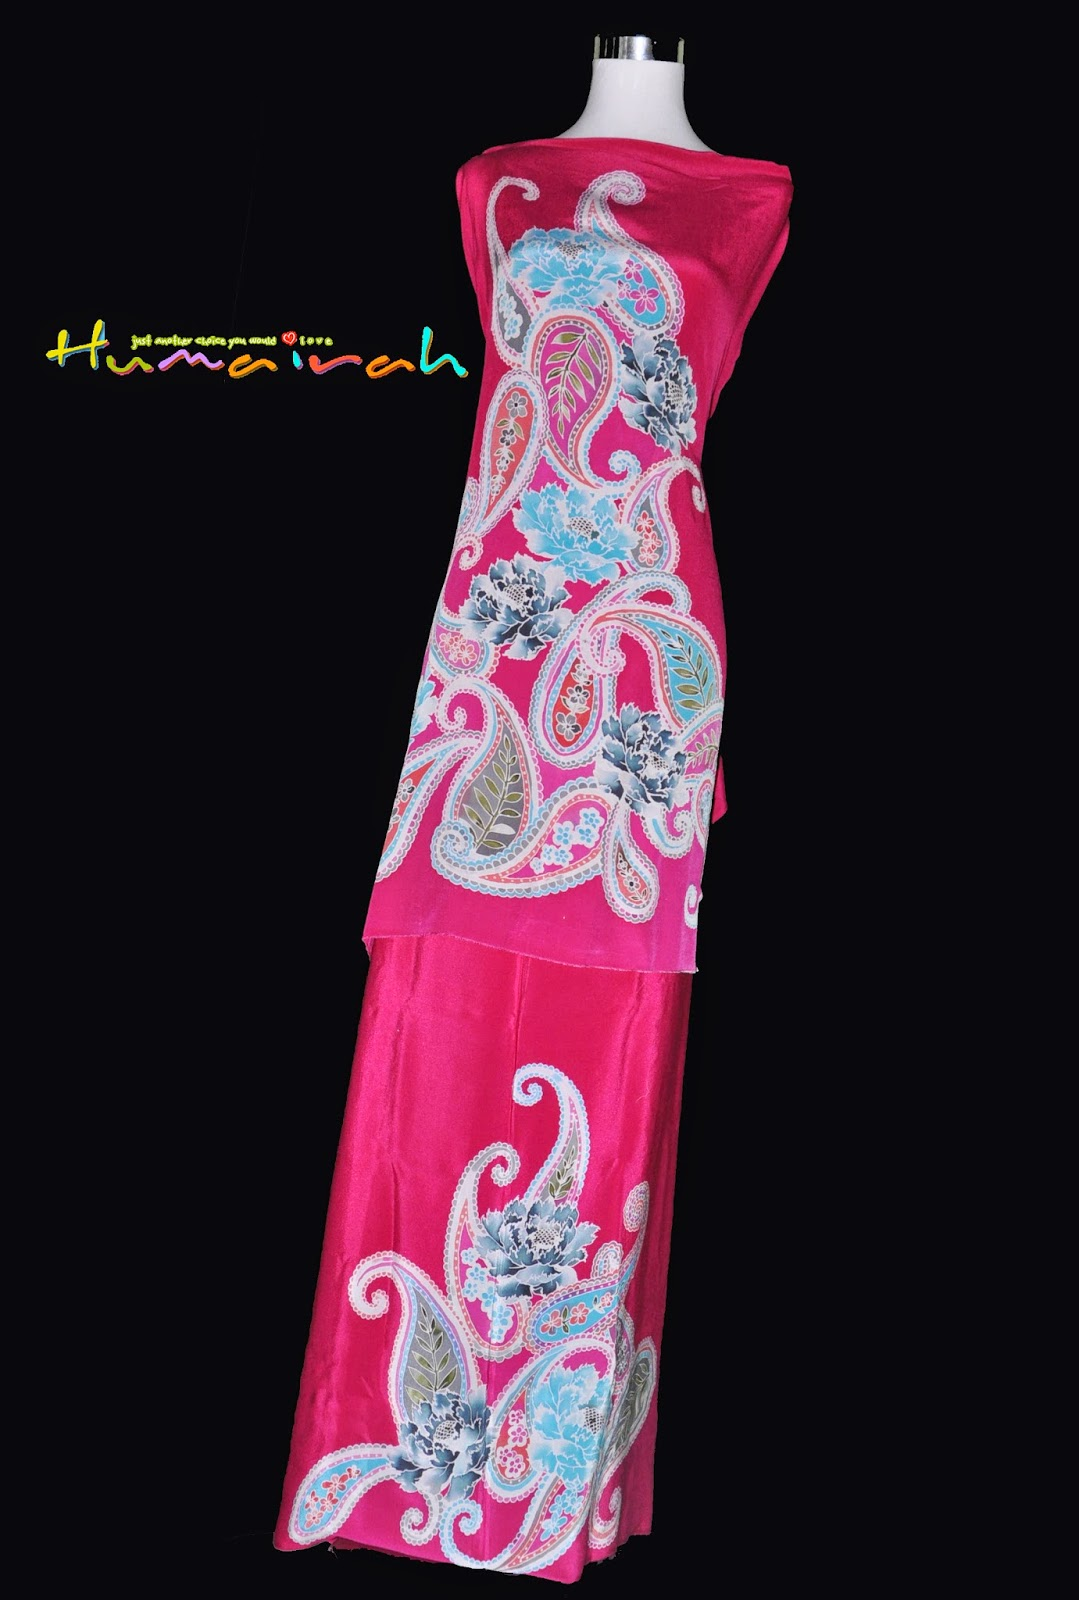 Batik Sutera Handmade Exclusive Paisley Pink 21